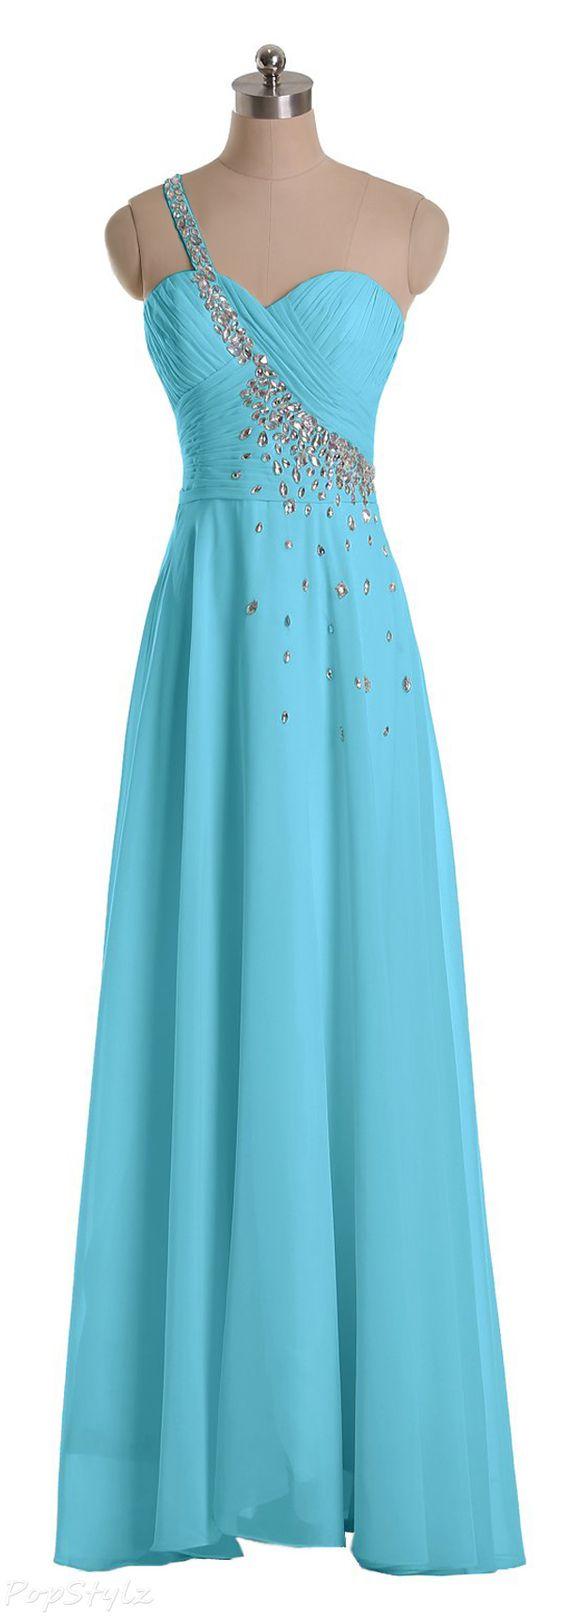 Sunvary 2015 Rhinestone One Shoulder Formal Dress